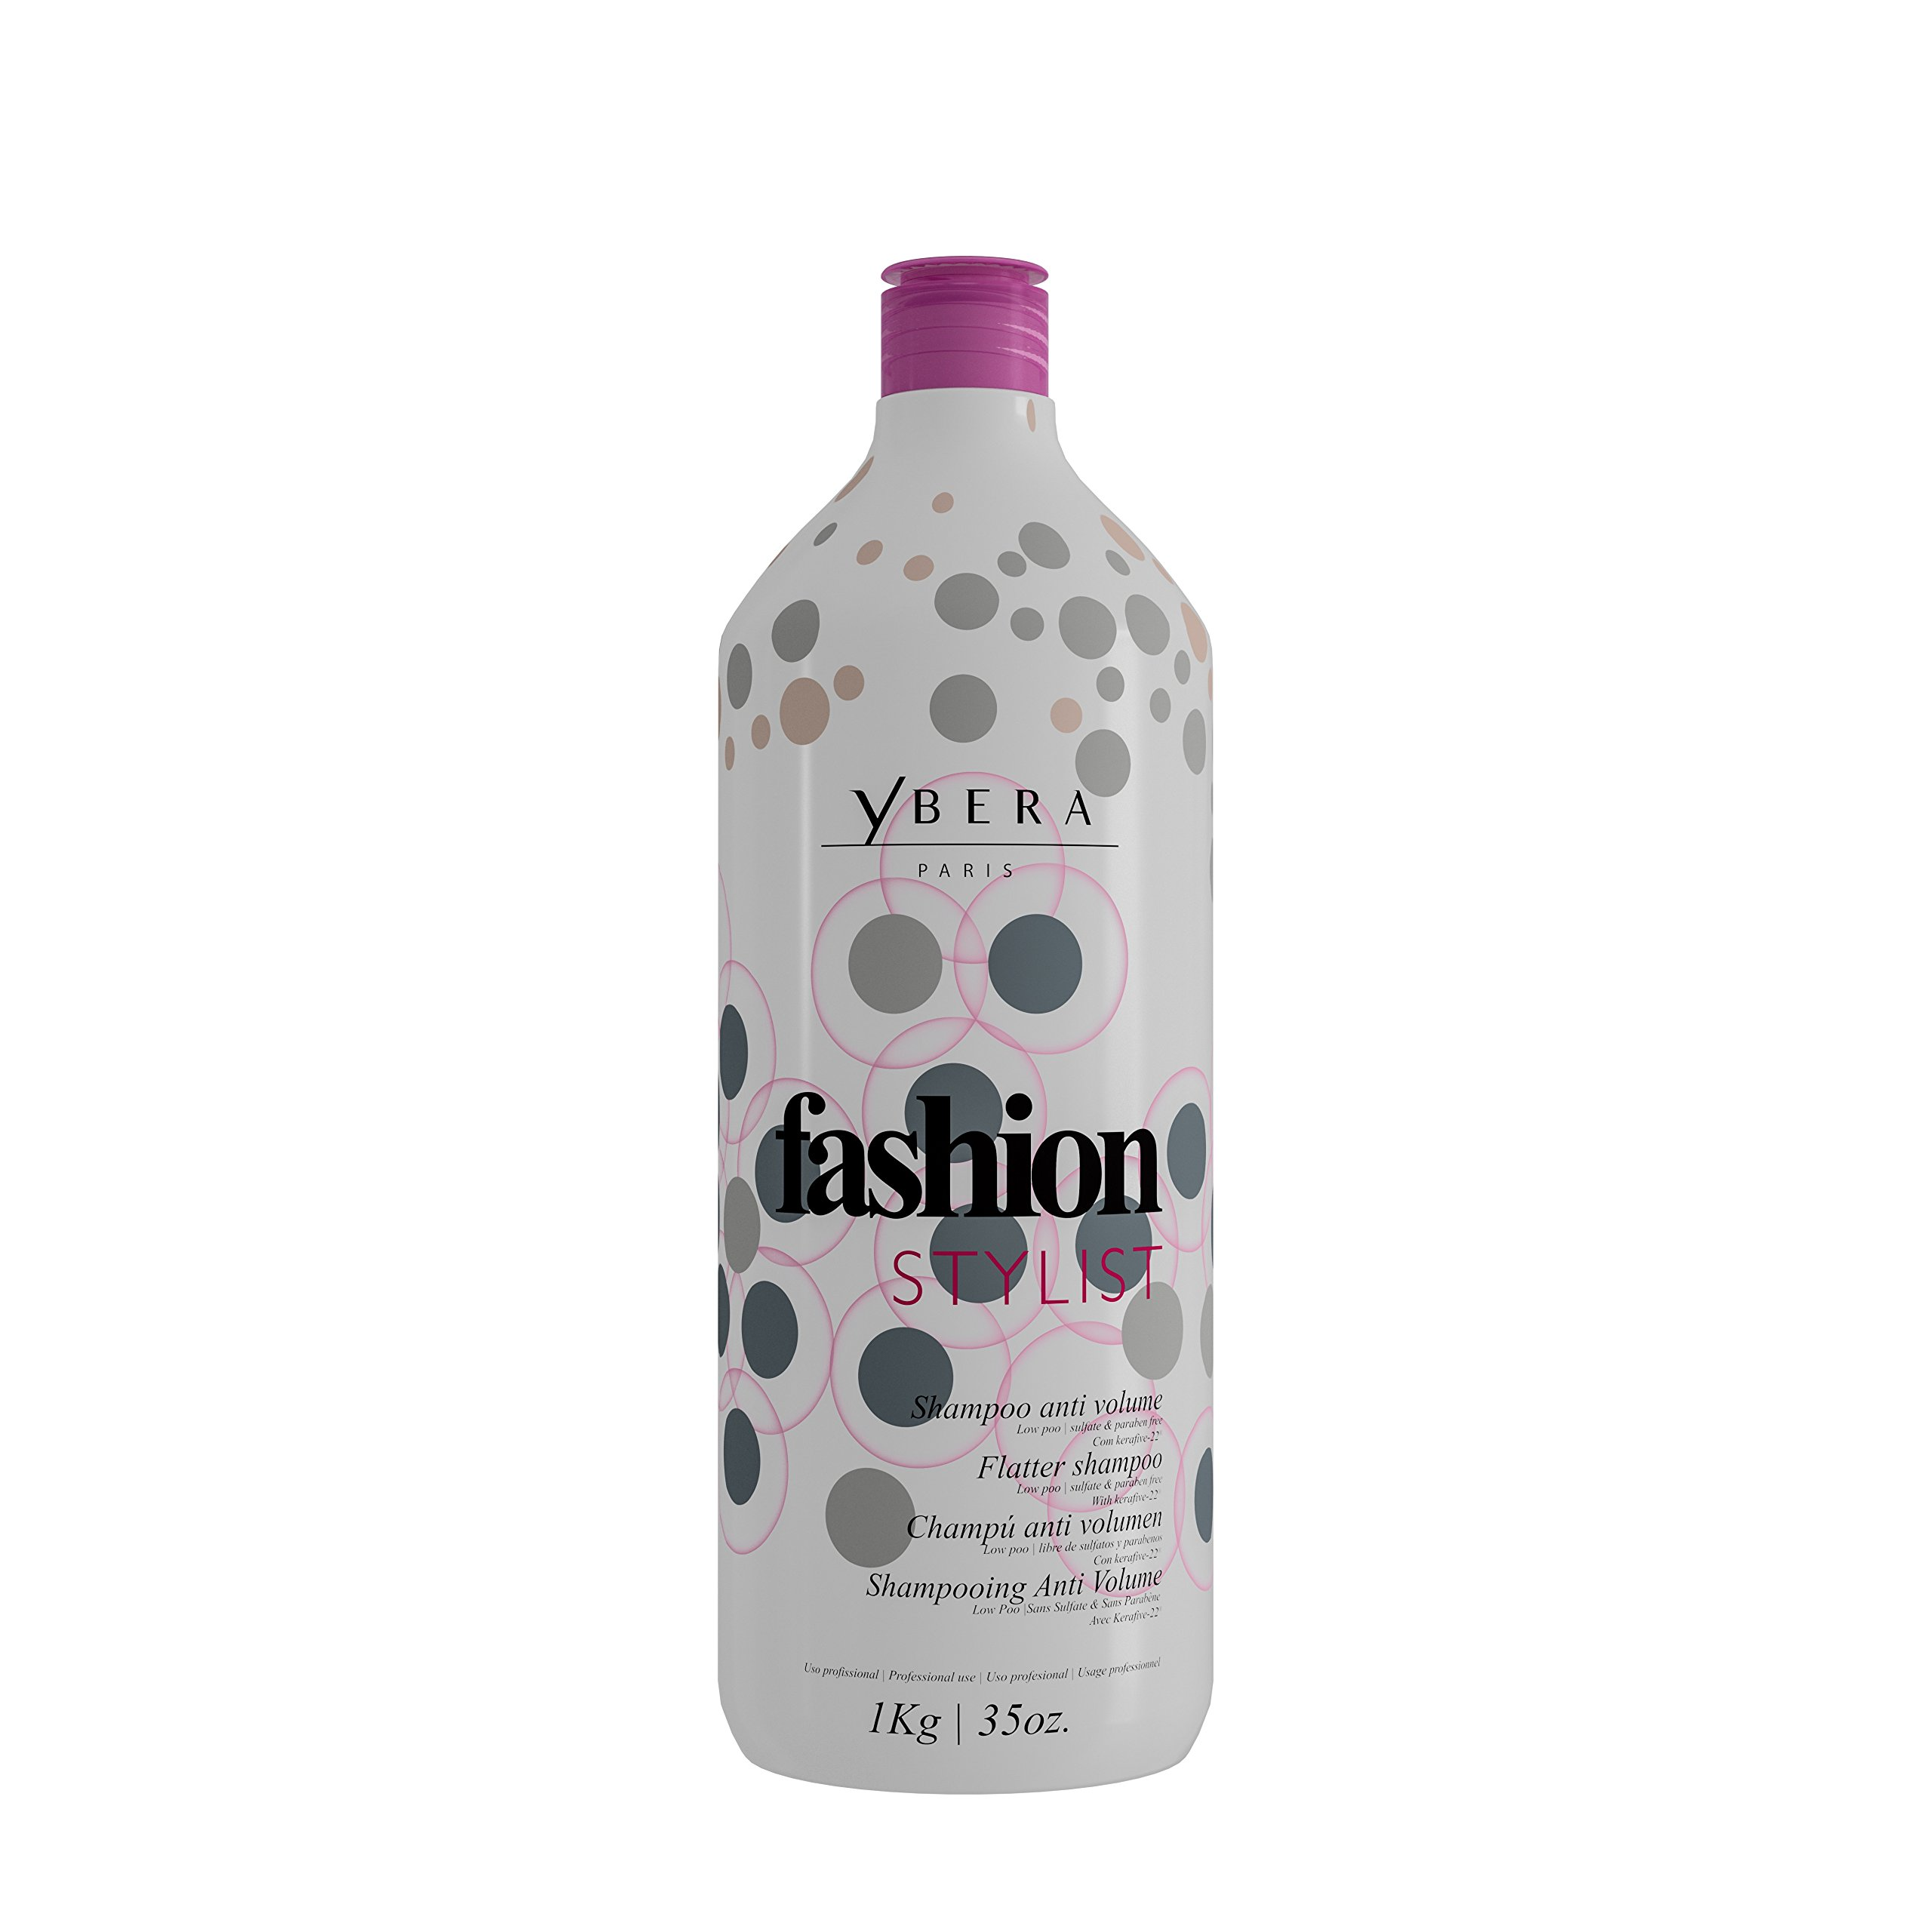 Keratin Ybera Fashion Stylist Shampoo Smooth and Extreme Shining Hair Enhanced with Omega 3, 6 and 9